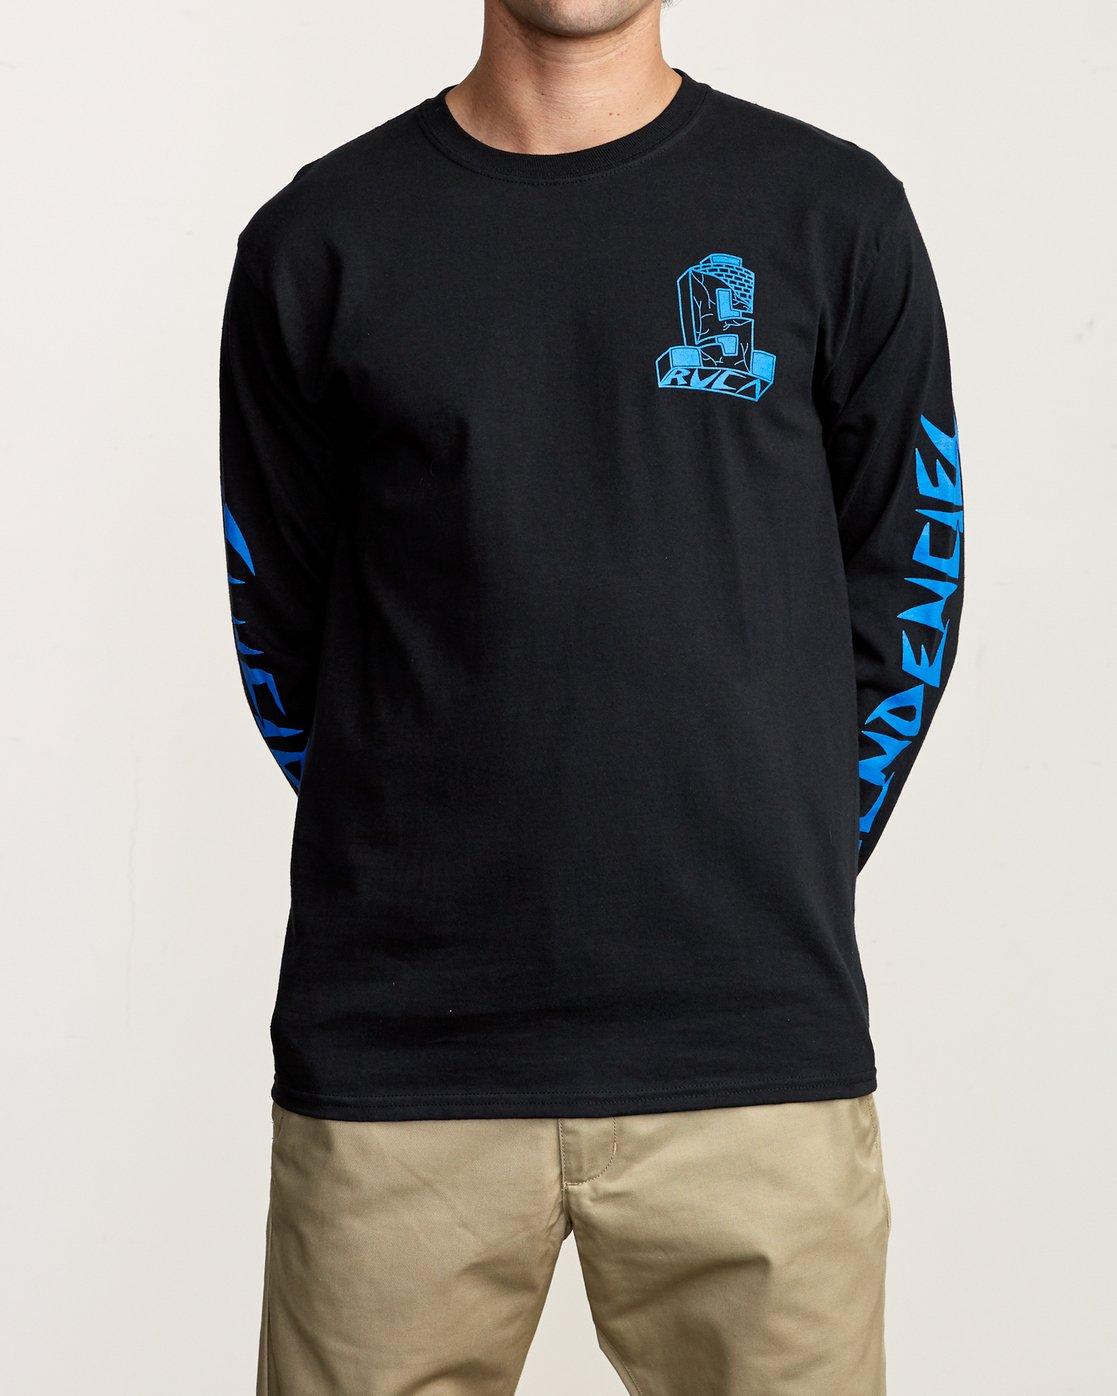 3 RVCA x Suicidal Tendencies Long Sleeve T-Shirt Black M459TRSU RVCA